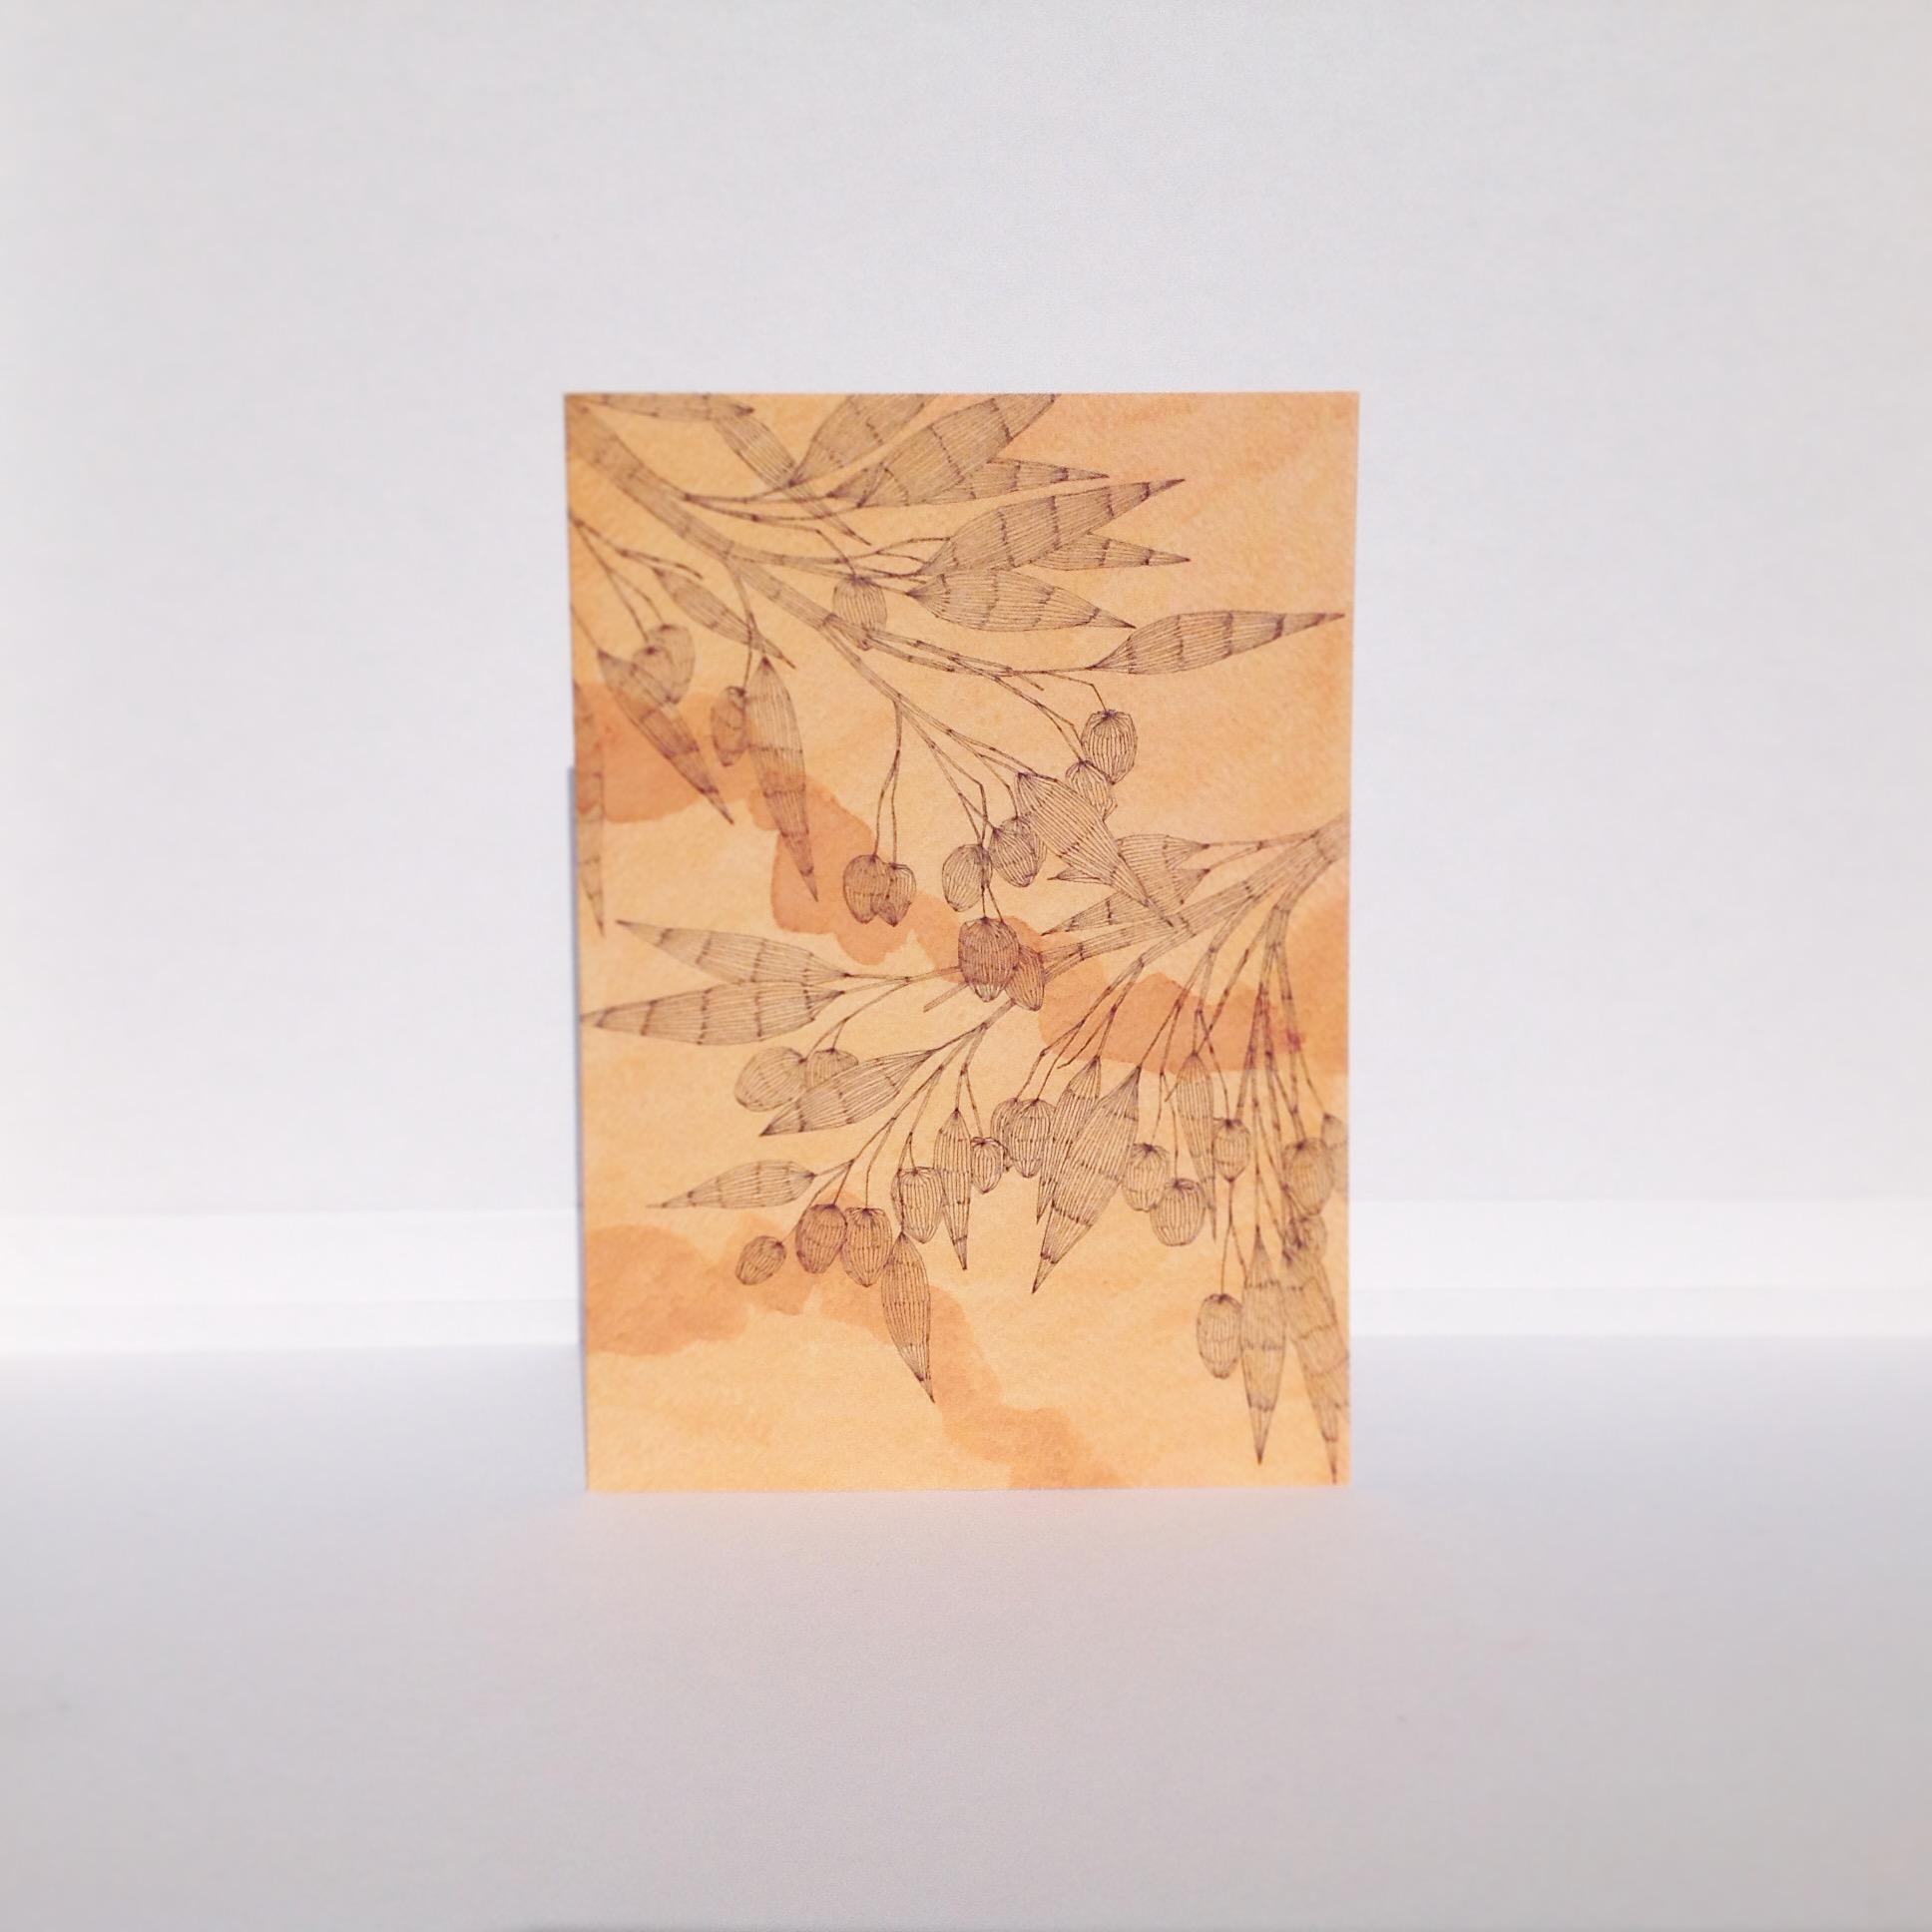 CARDS. NOVEMBER 2017 (20).JPG